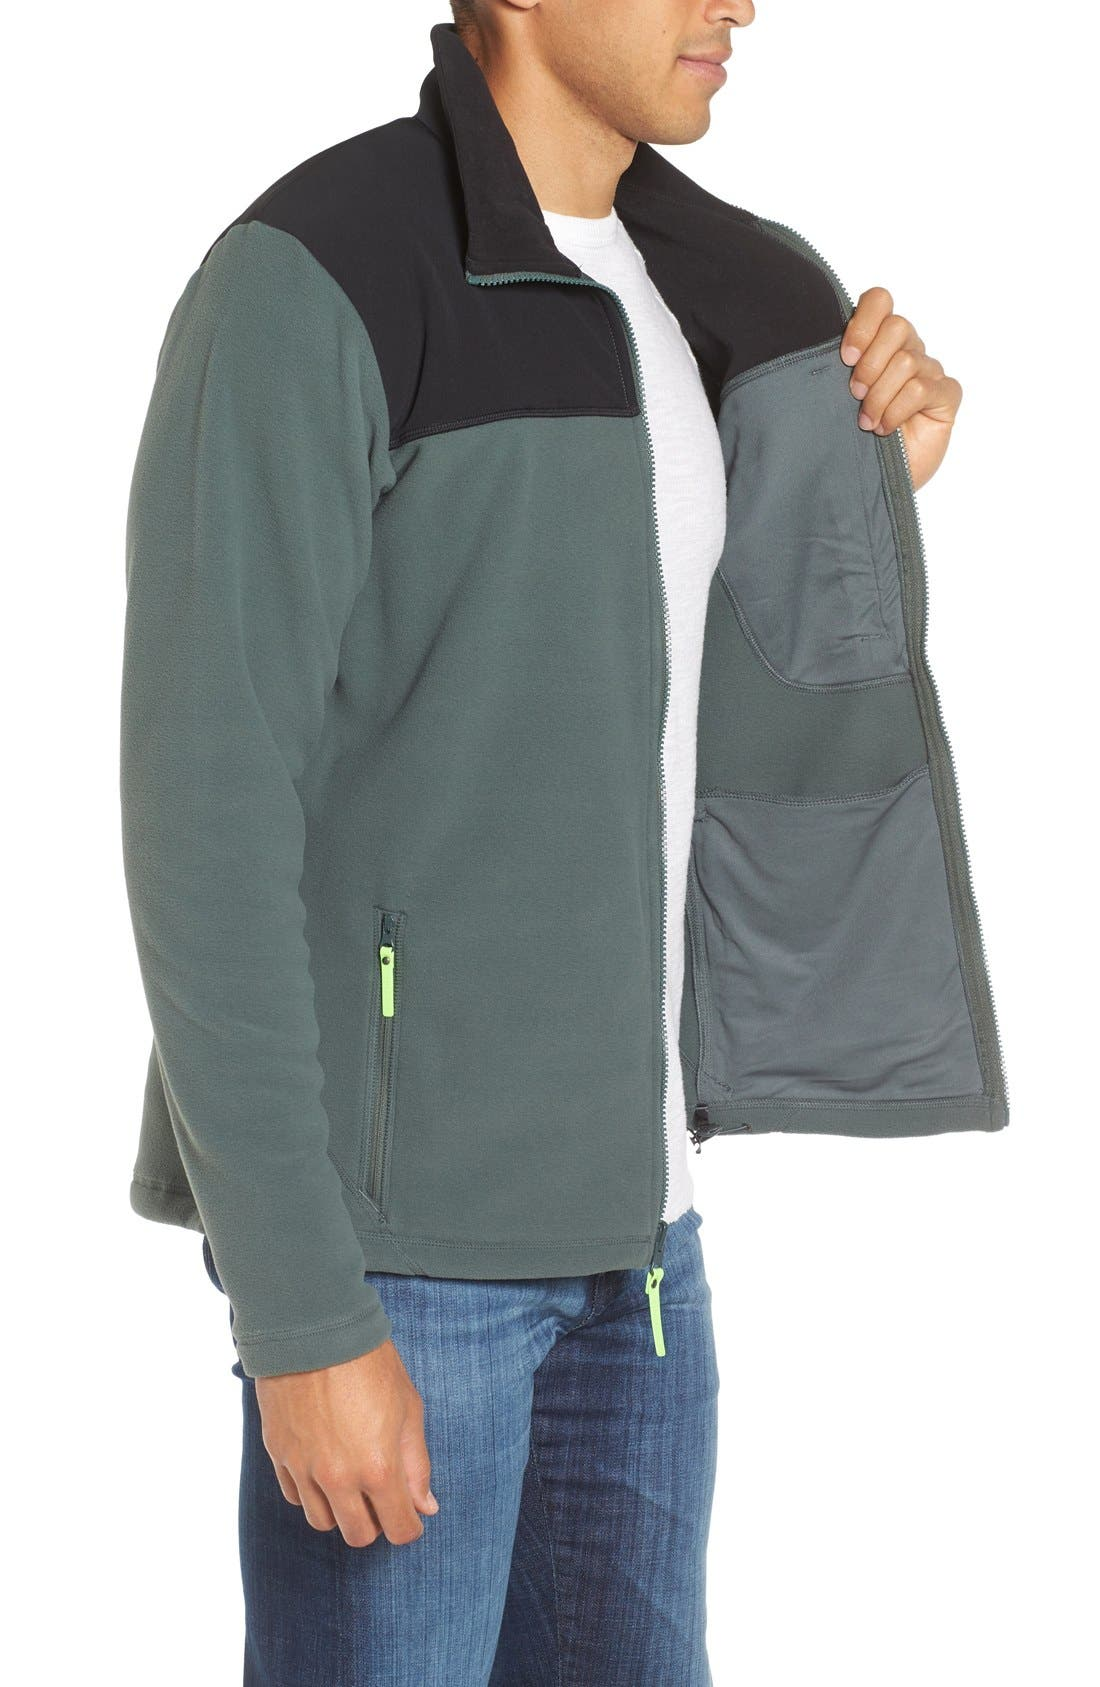 Sitka Fleece Jacket,                             Alternate thumbnail 8, color,